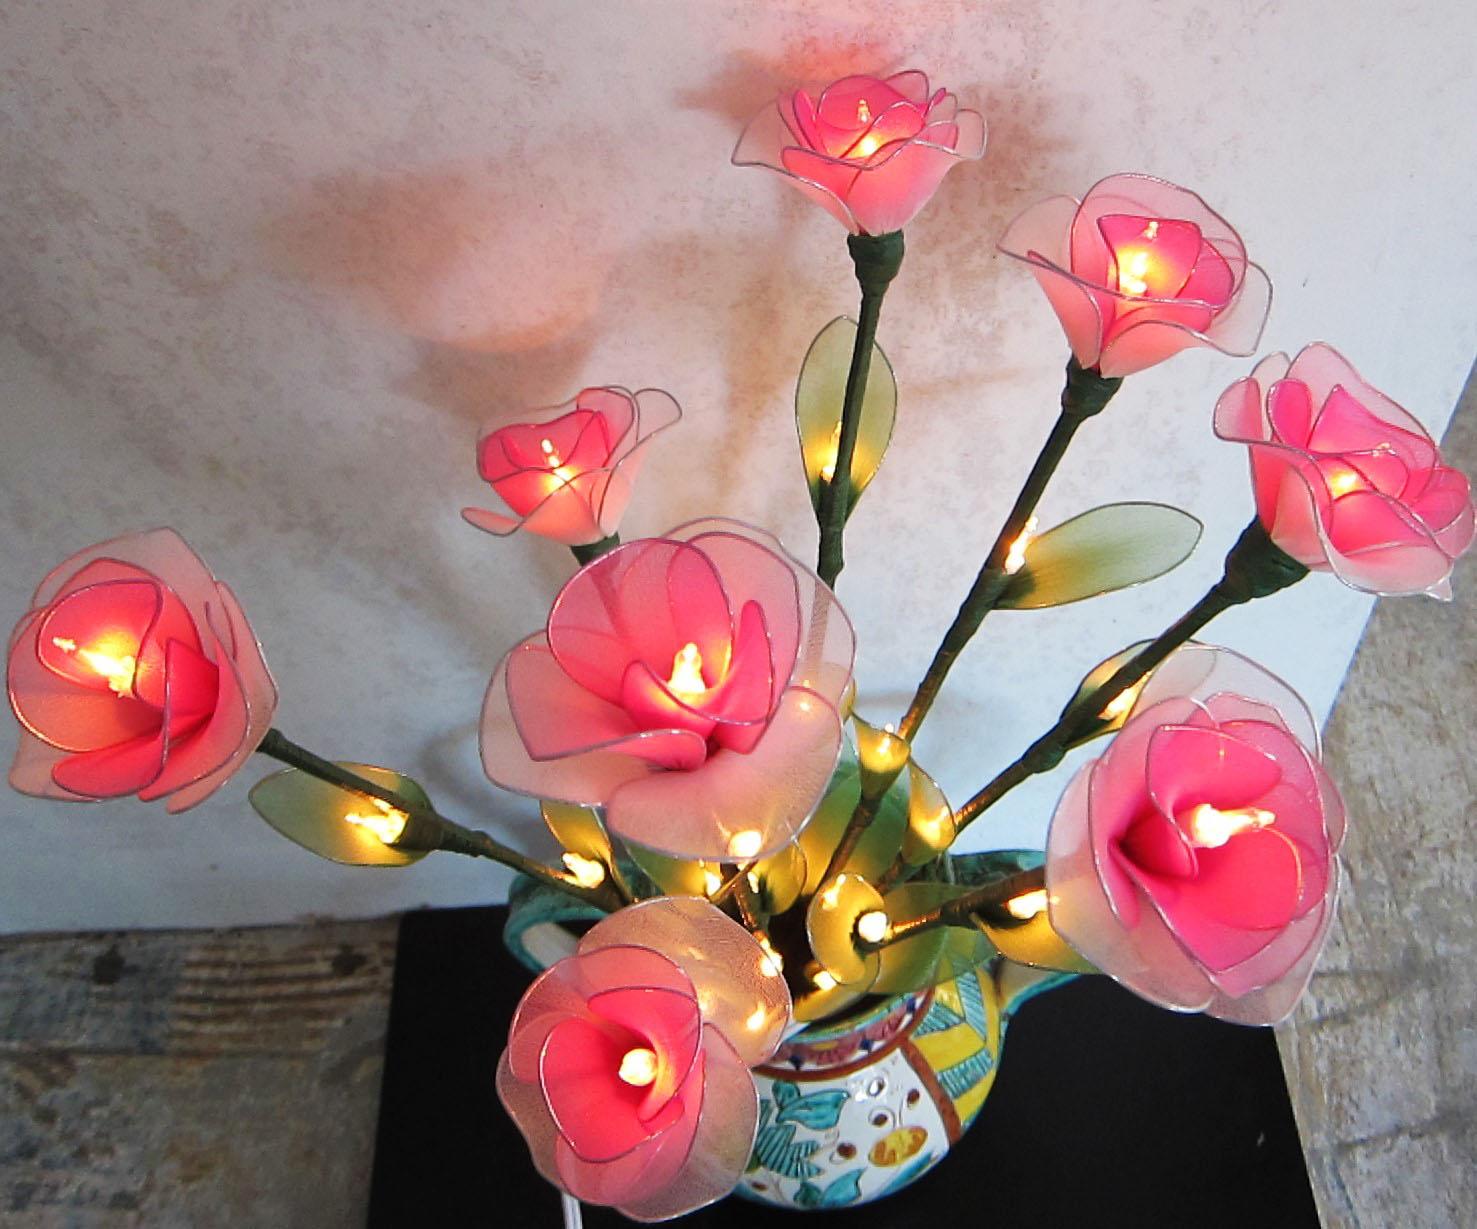 Flower Lights__4058